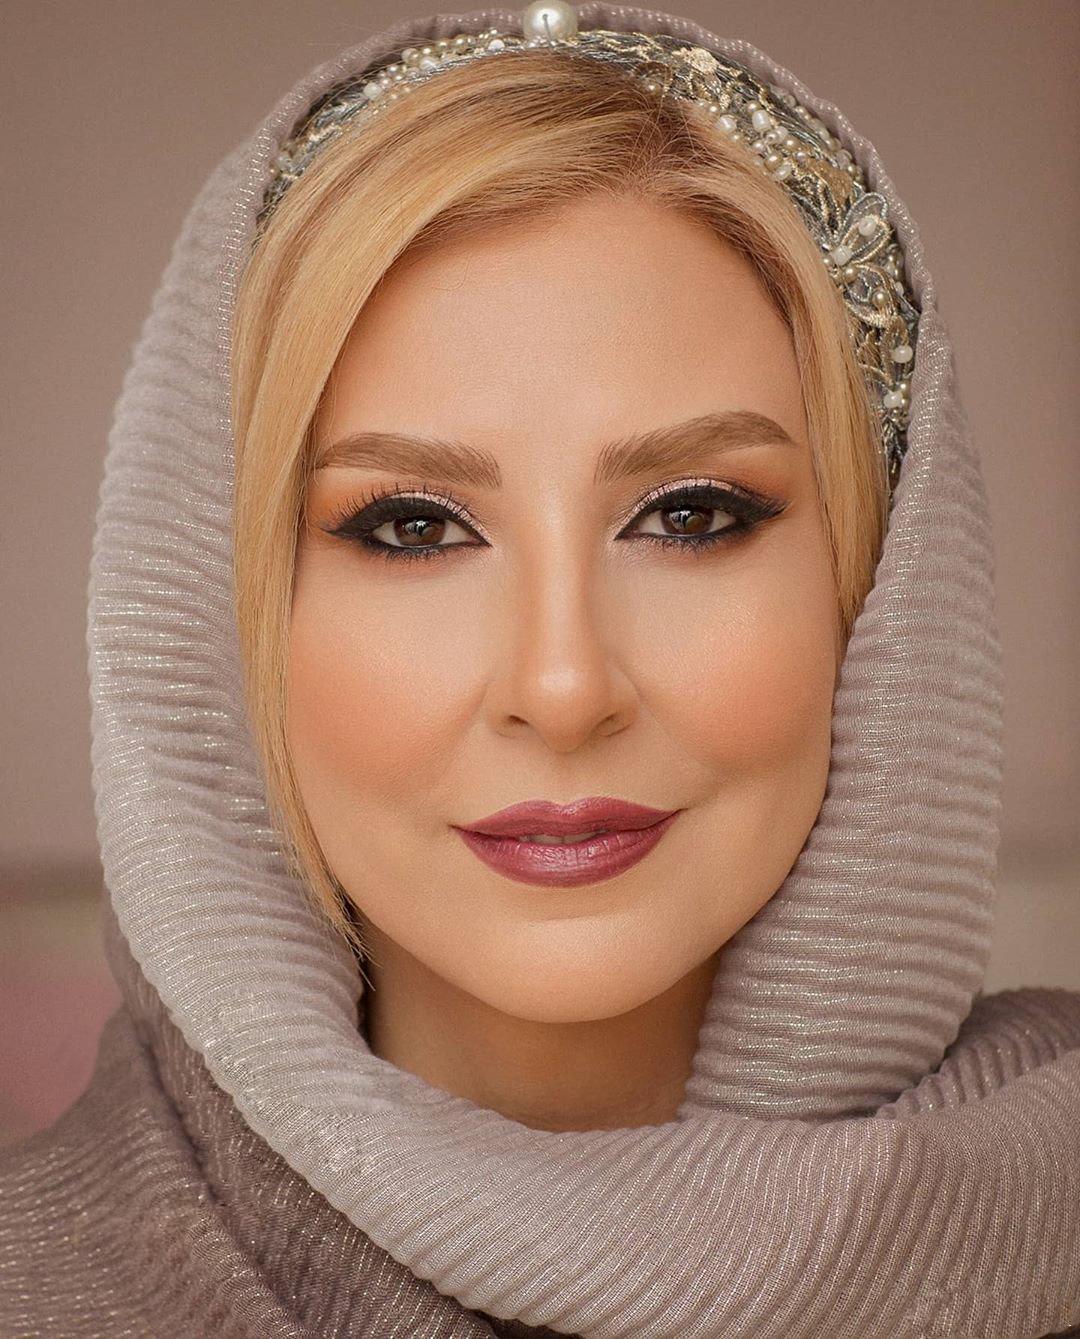 عکس و بیوگرافی مرجانه گلچین Marjaneh Golchin